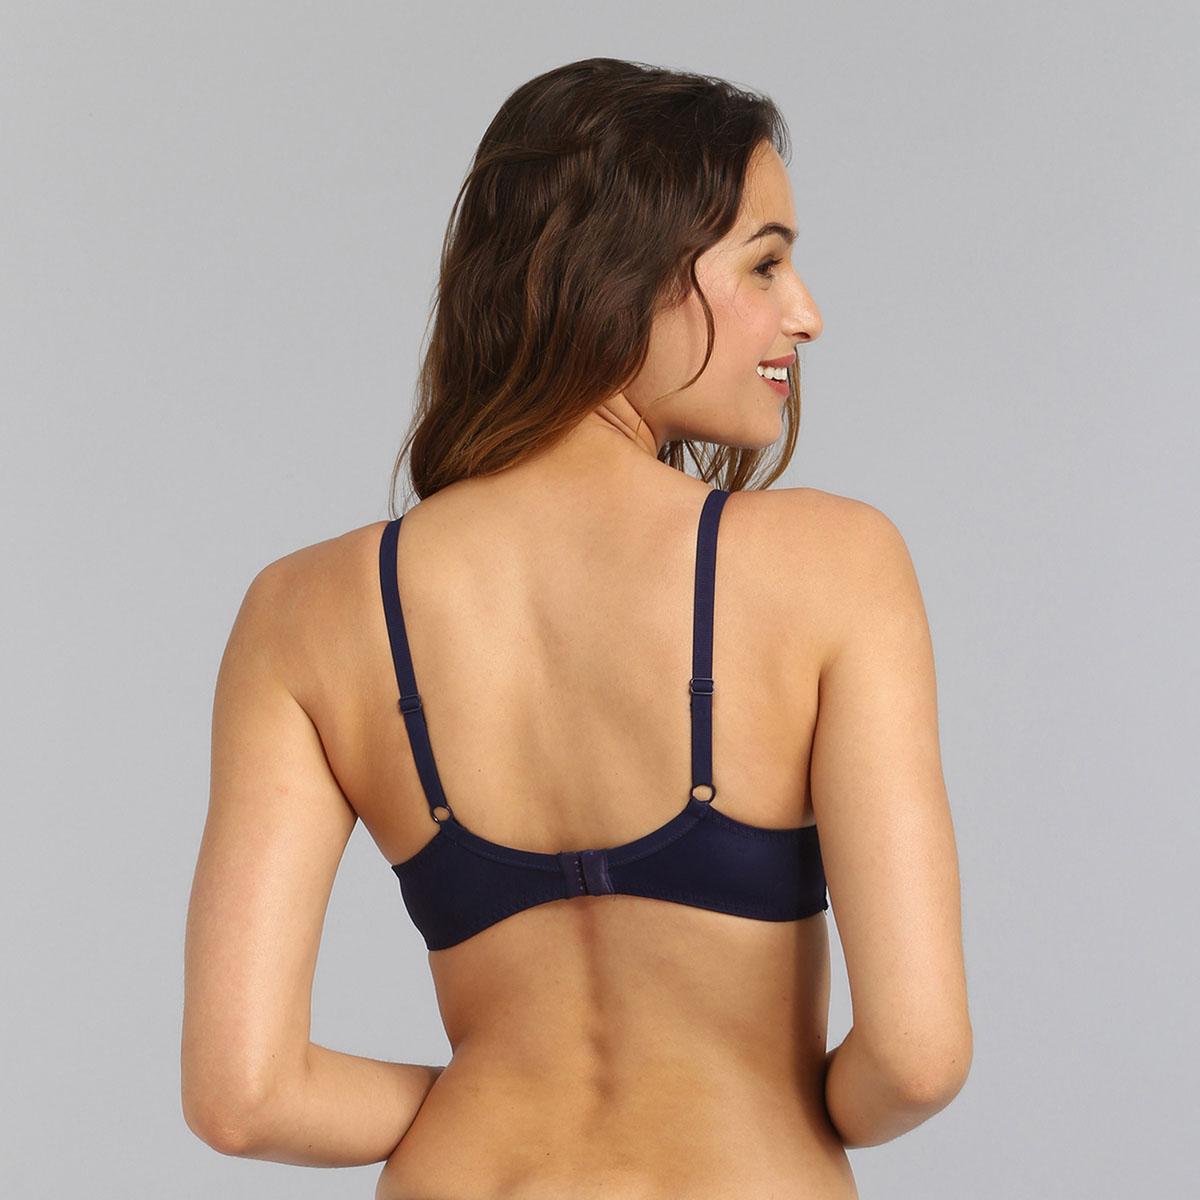 Underwired bra in navy Essential Elegance Embroidery, , PLAYTEX